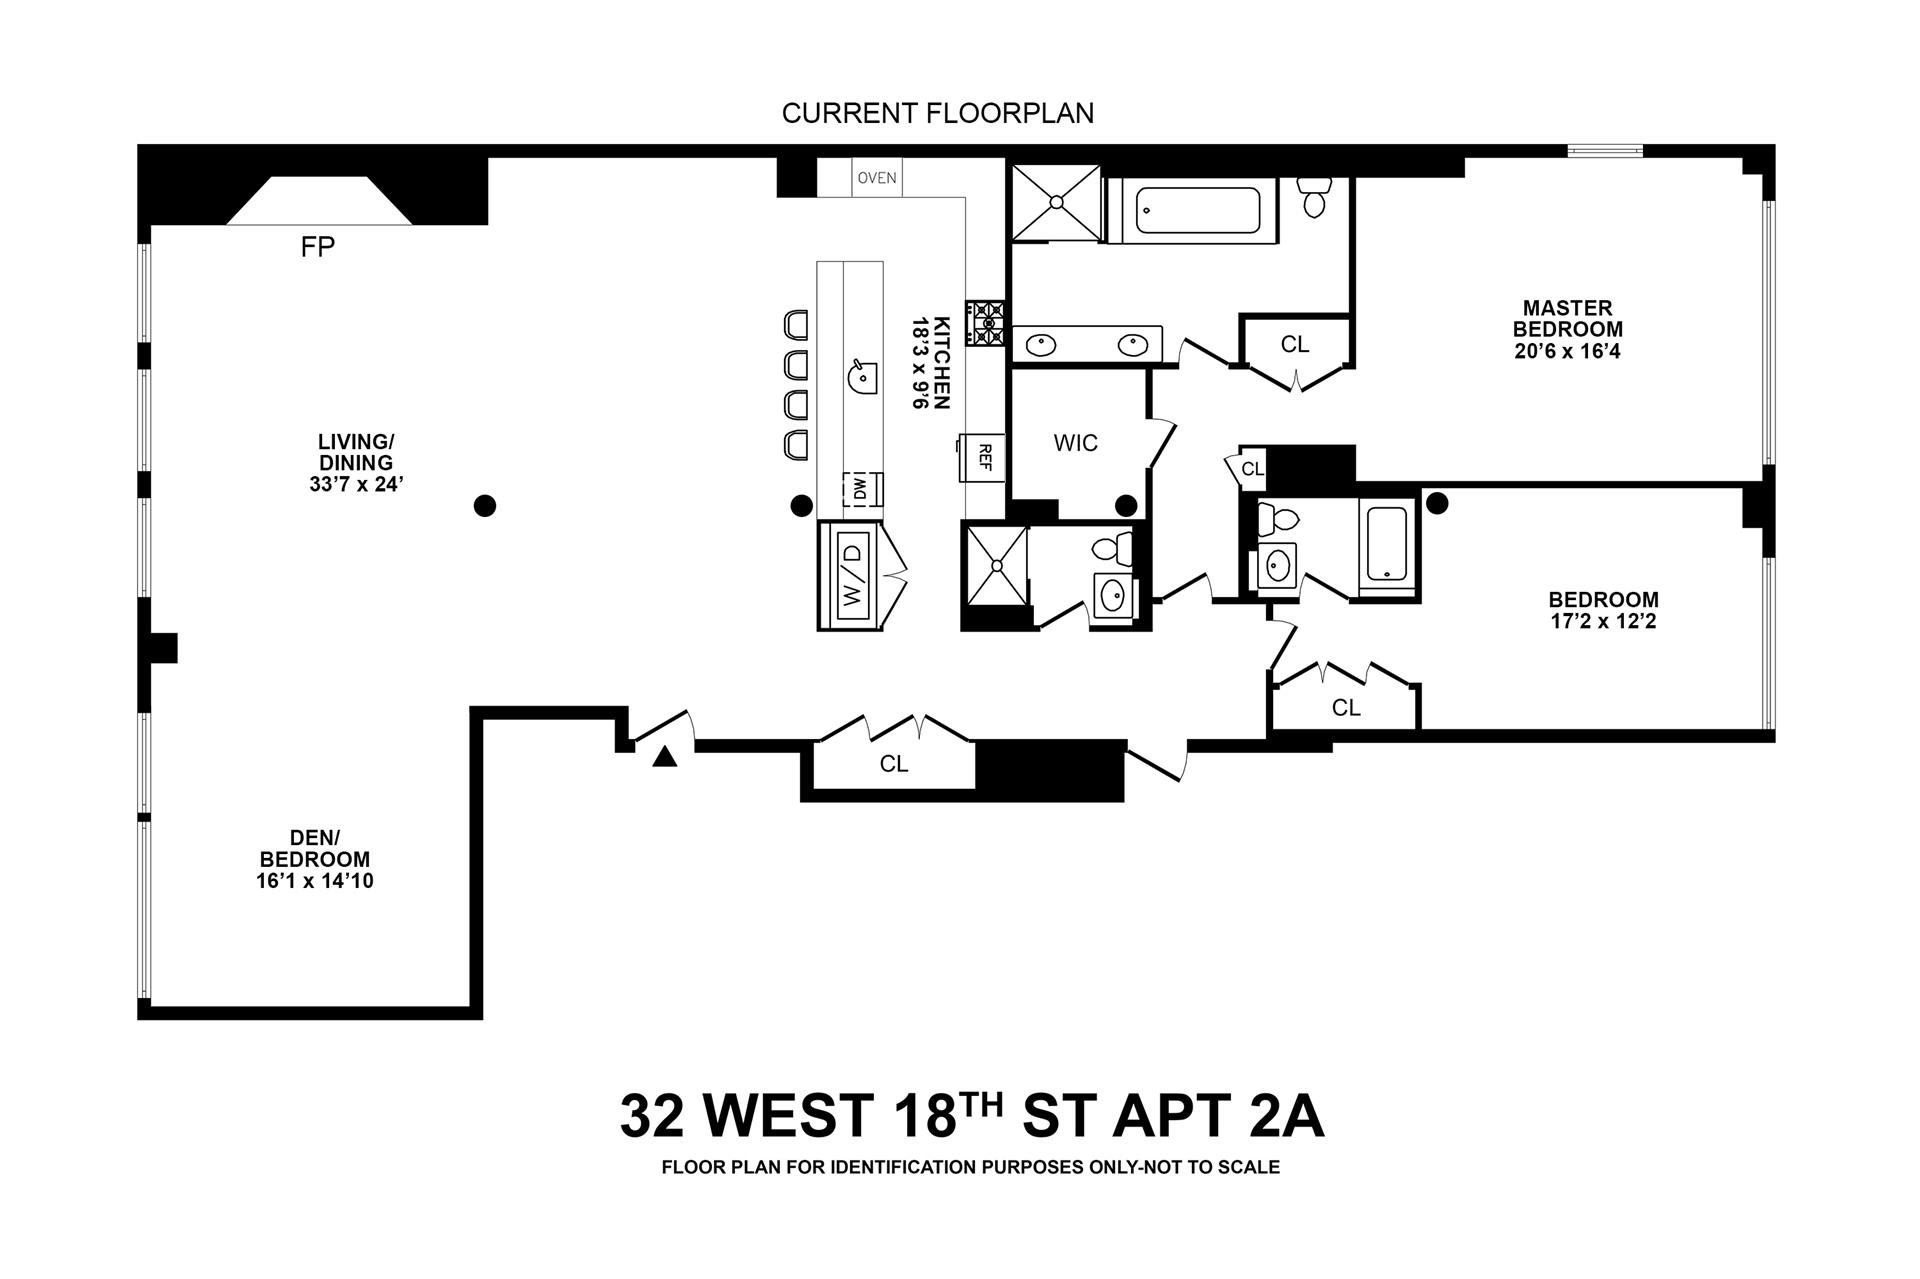 Property Listings Oren Alexander Alexander Team New